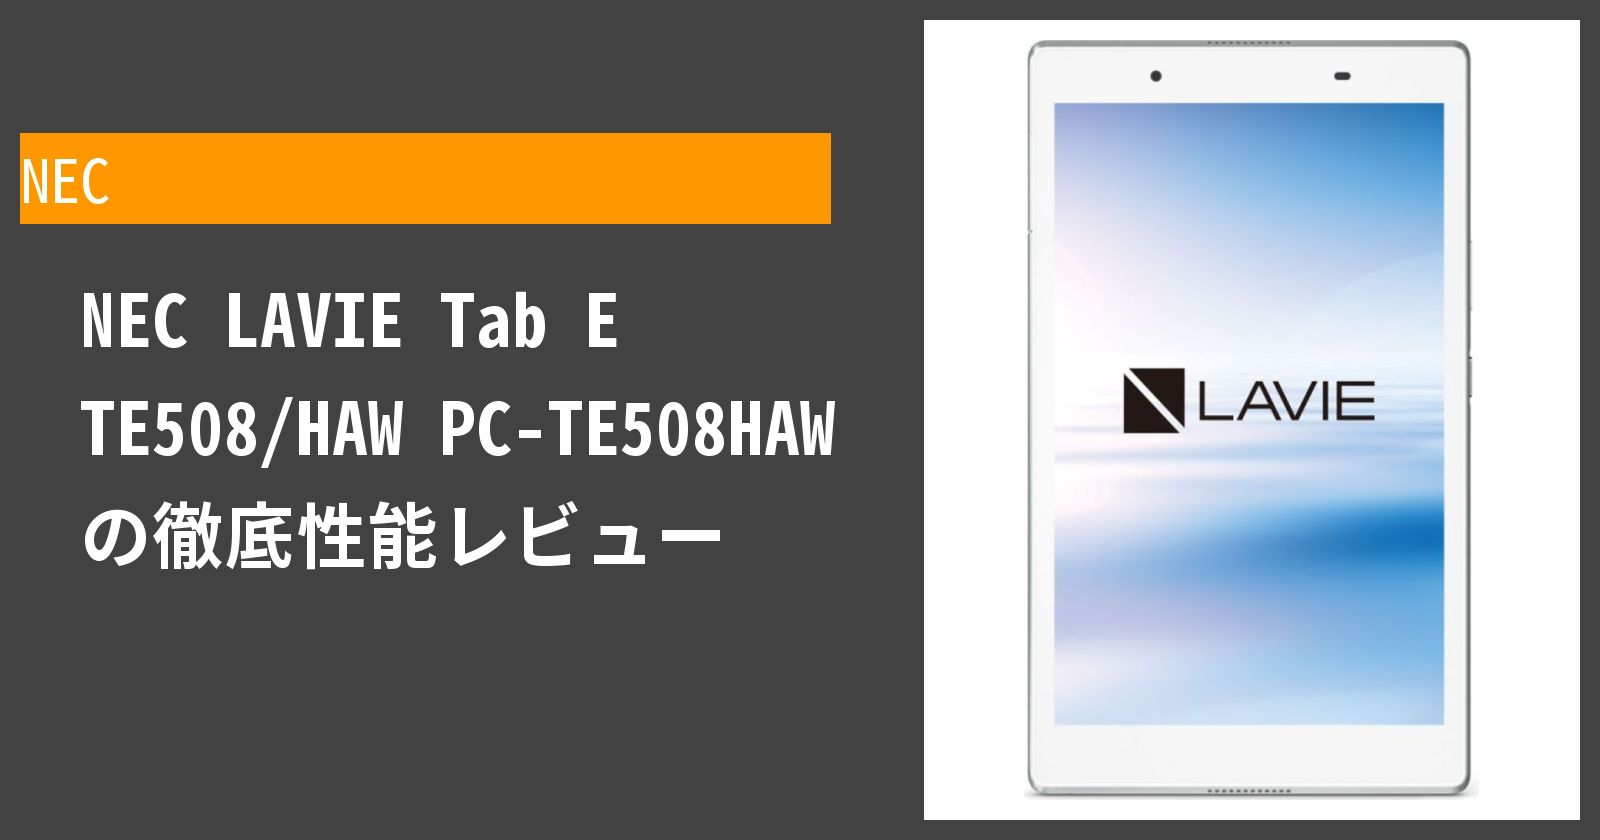 LAVIE Tab E TE508/HAW PC-TE508HAW の徹底性能レビュー